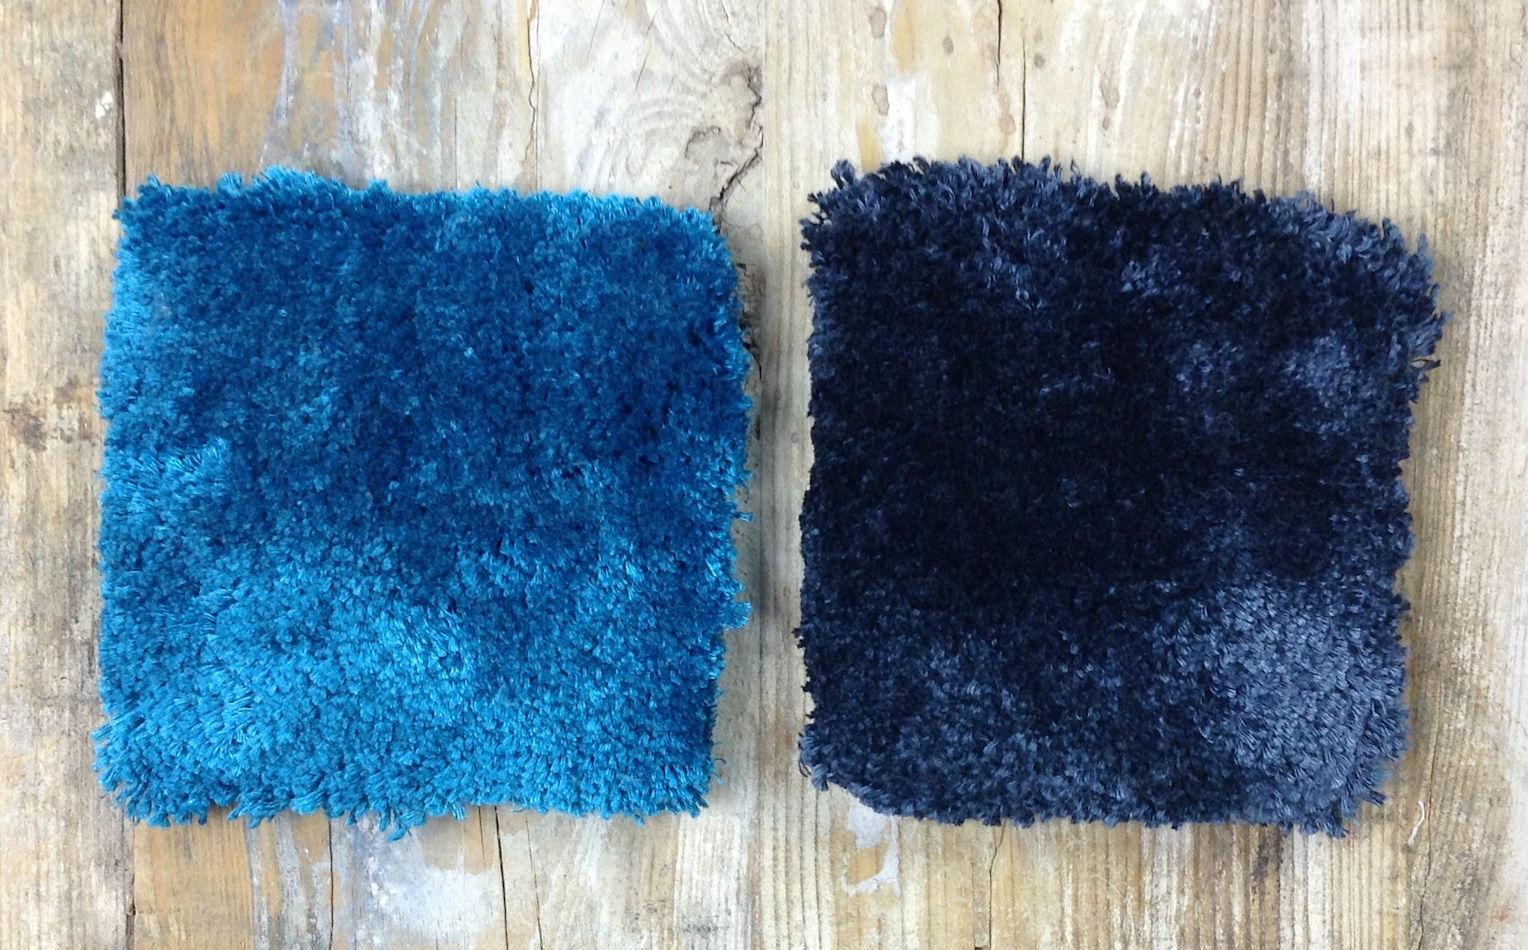 Tienda online alfombras ao kilate 608 azul cobalto for Alfombras online